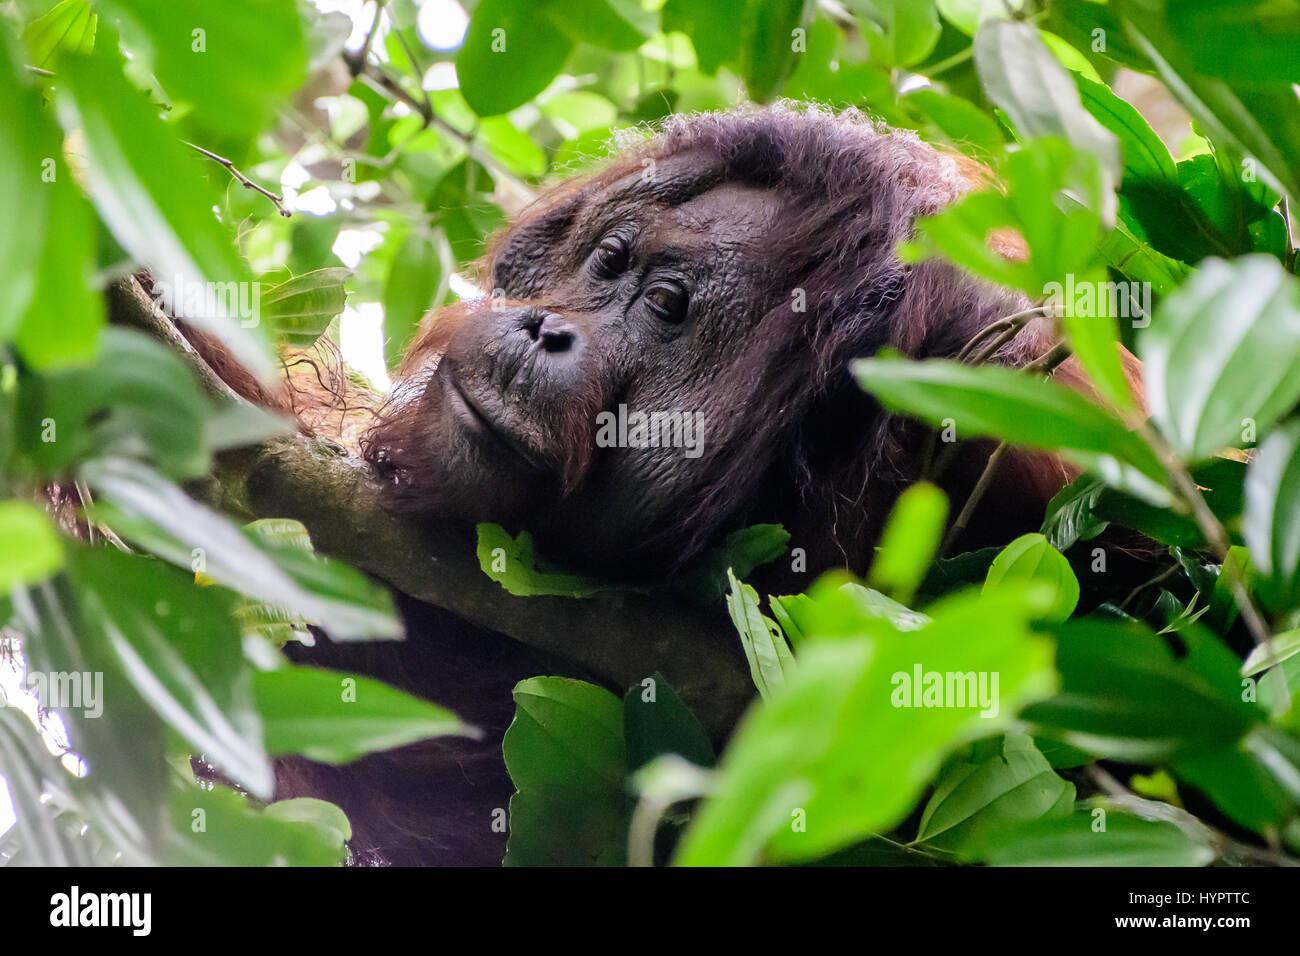 Kopf geschossen eines männlichen Flansch Orang-utan Stockbild